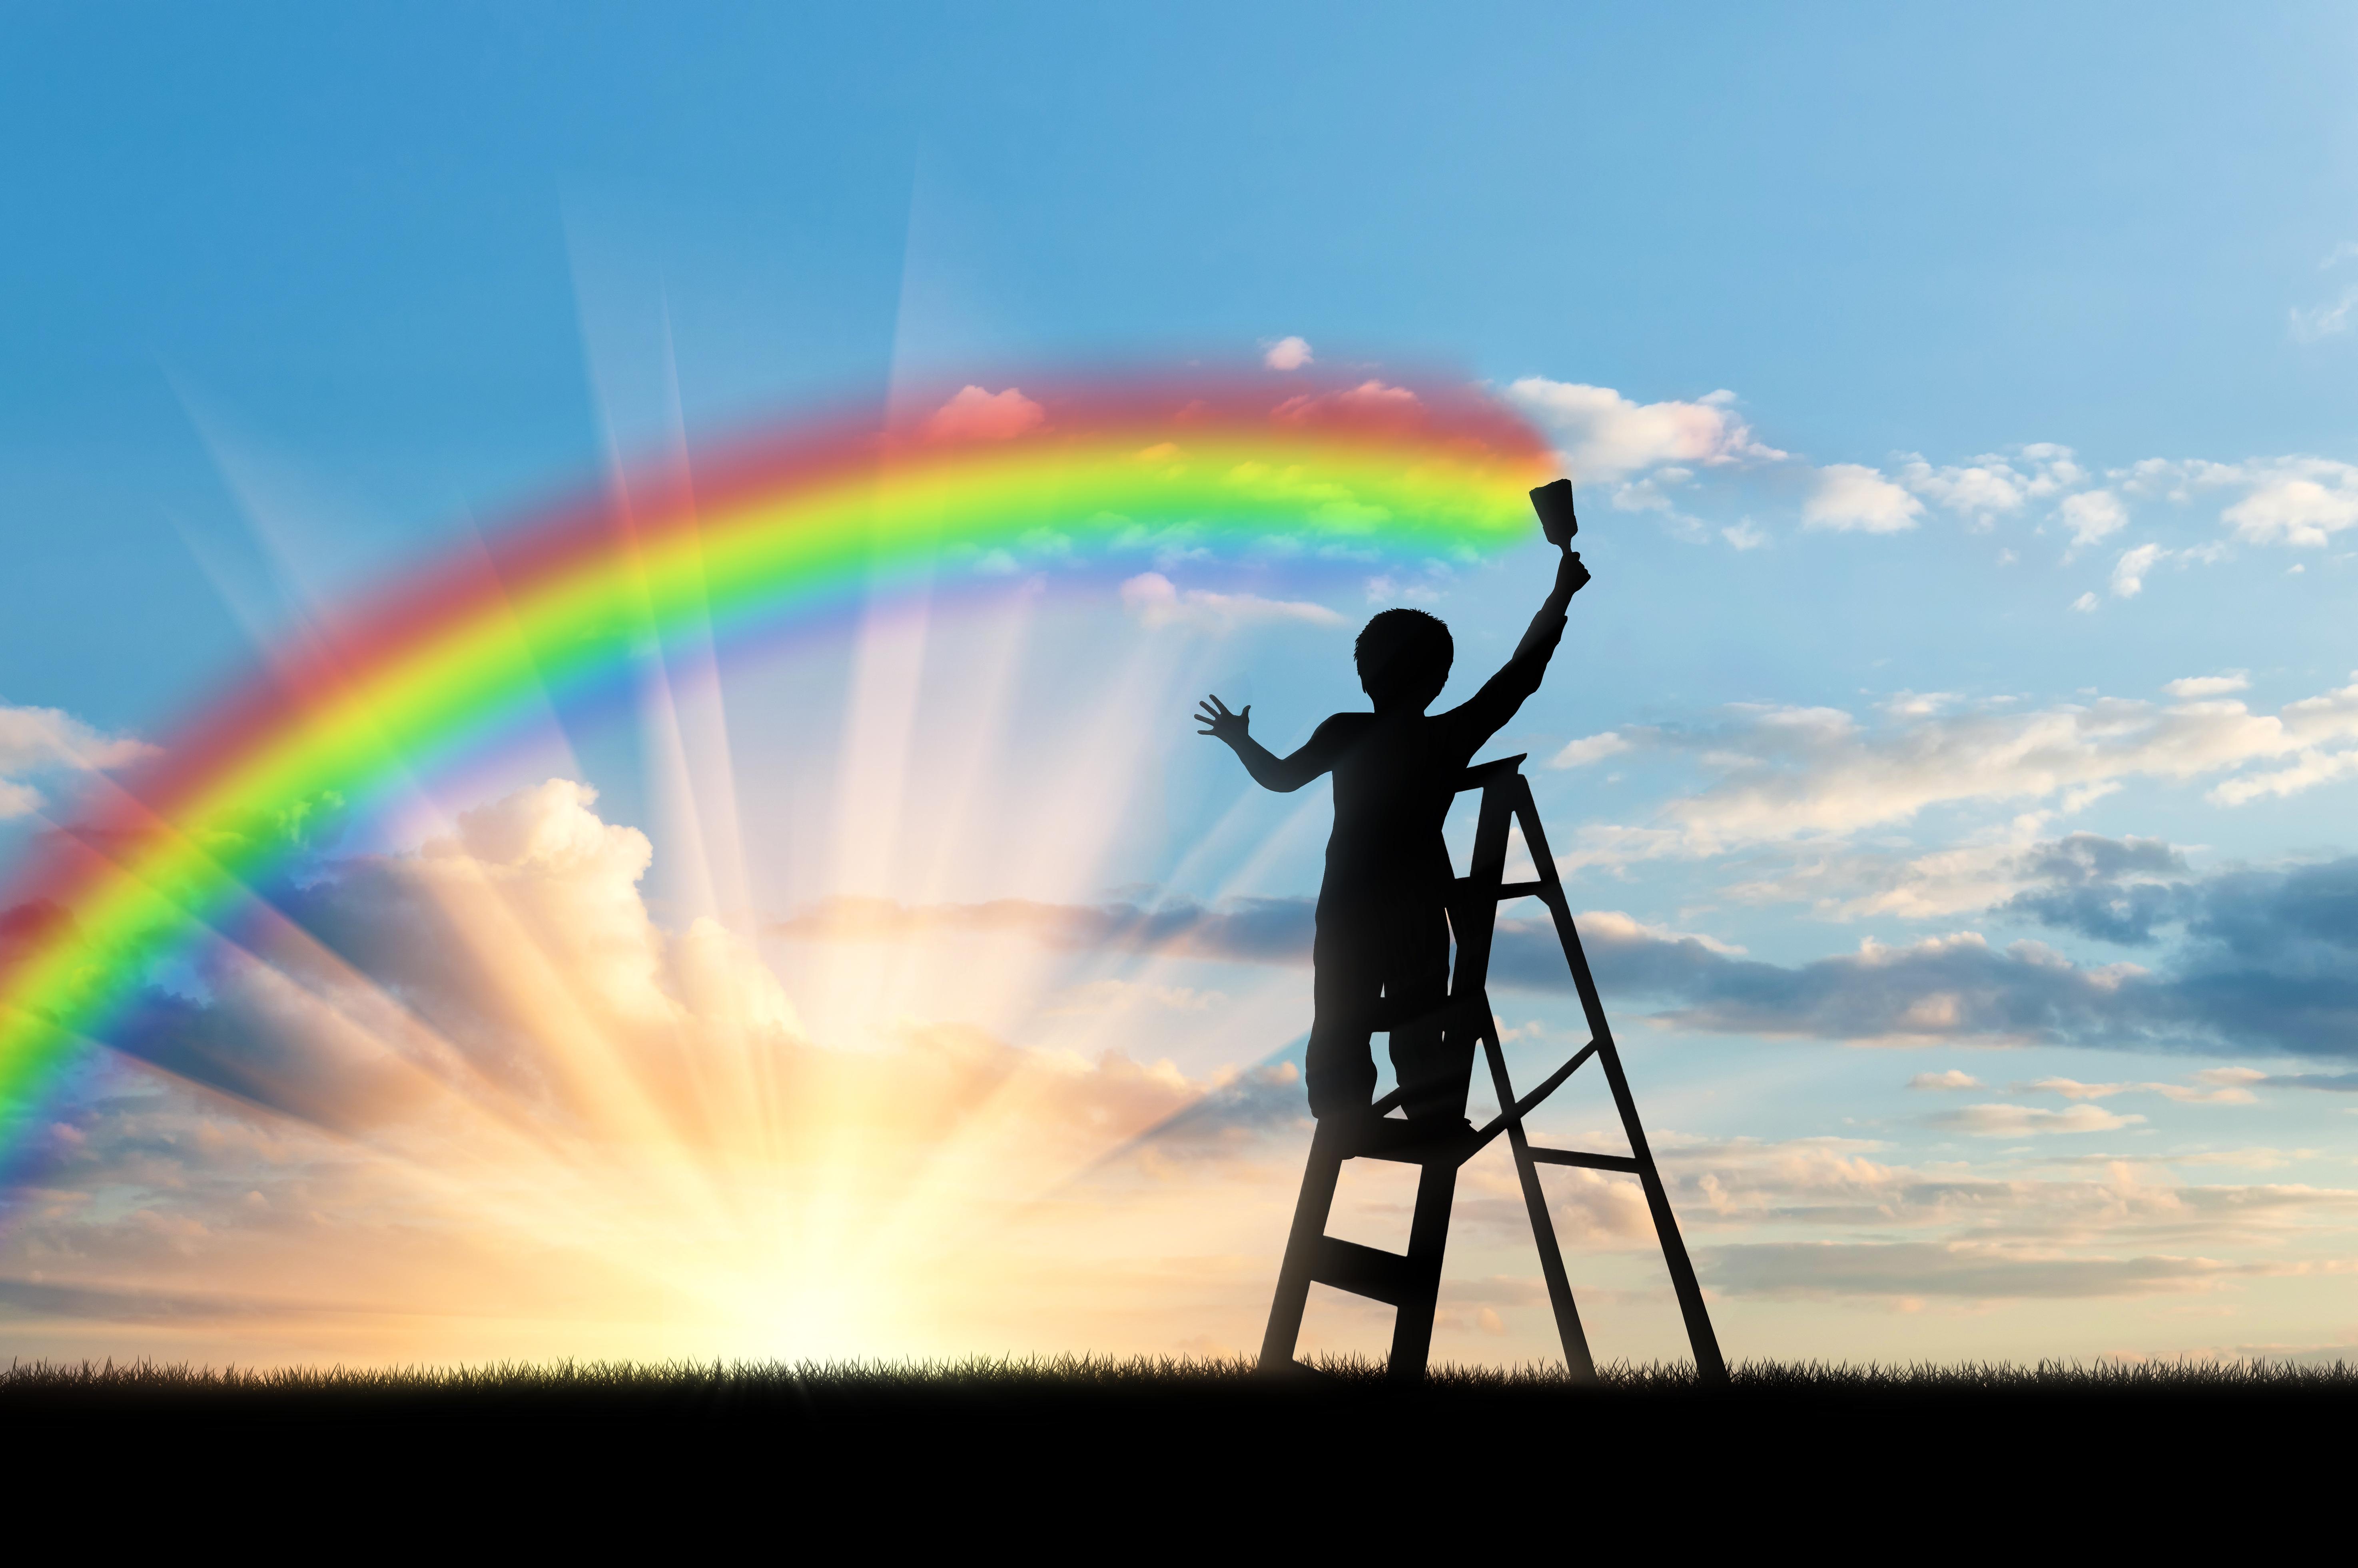 Rainbow Wall of Hope